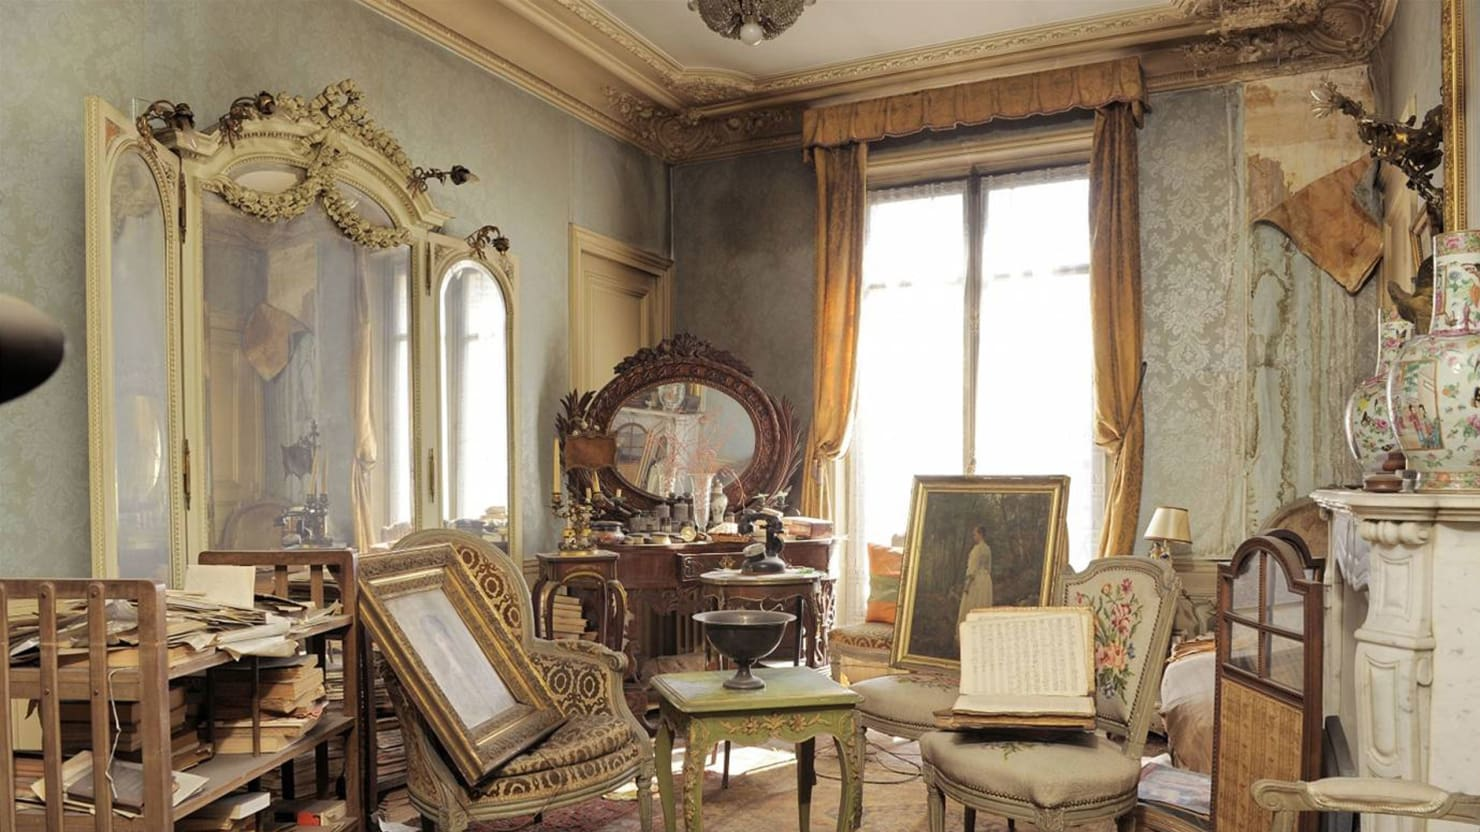 140203-paris-apartment-strochlic-tease_ho752a.jpg